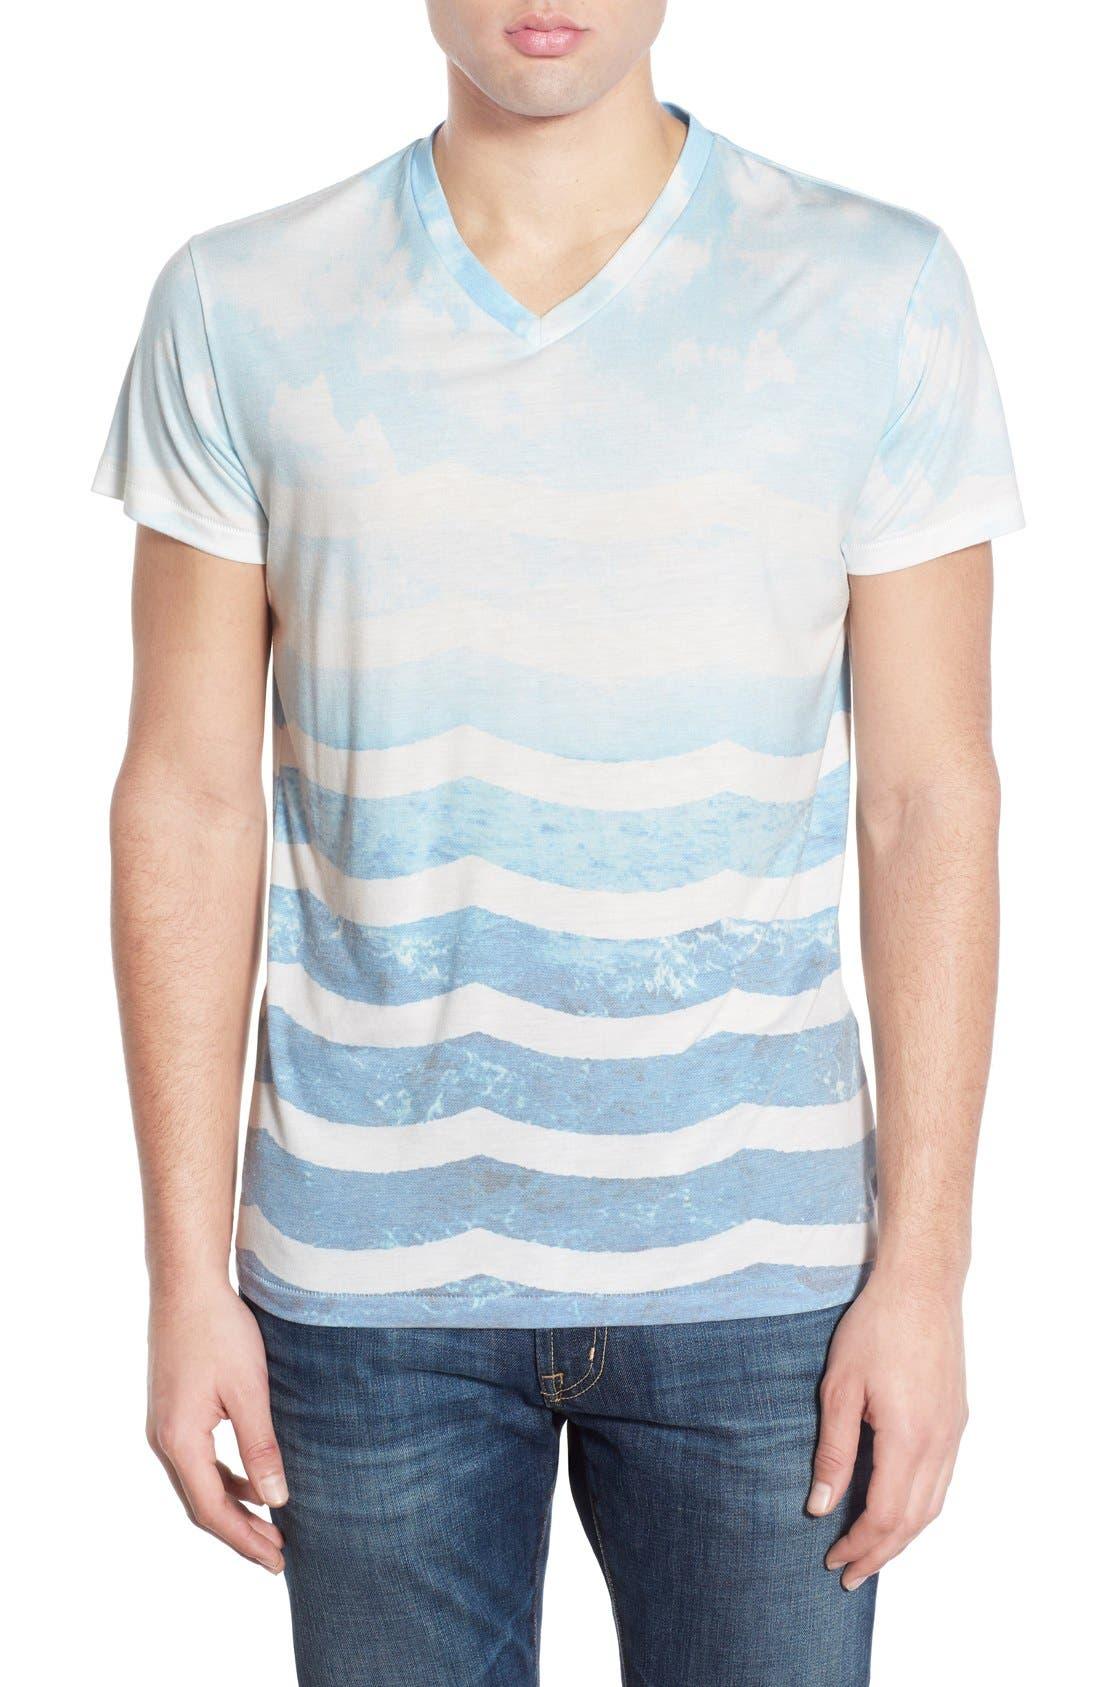 SOL ANGELES 'Marine Layer' V-Neck T-Shirt, Main, color, 482